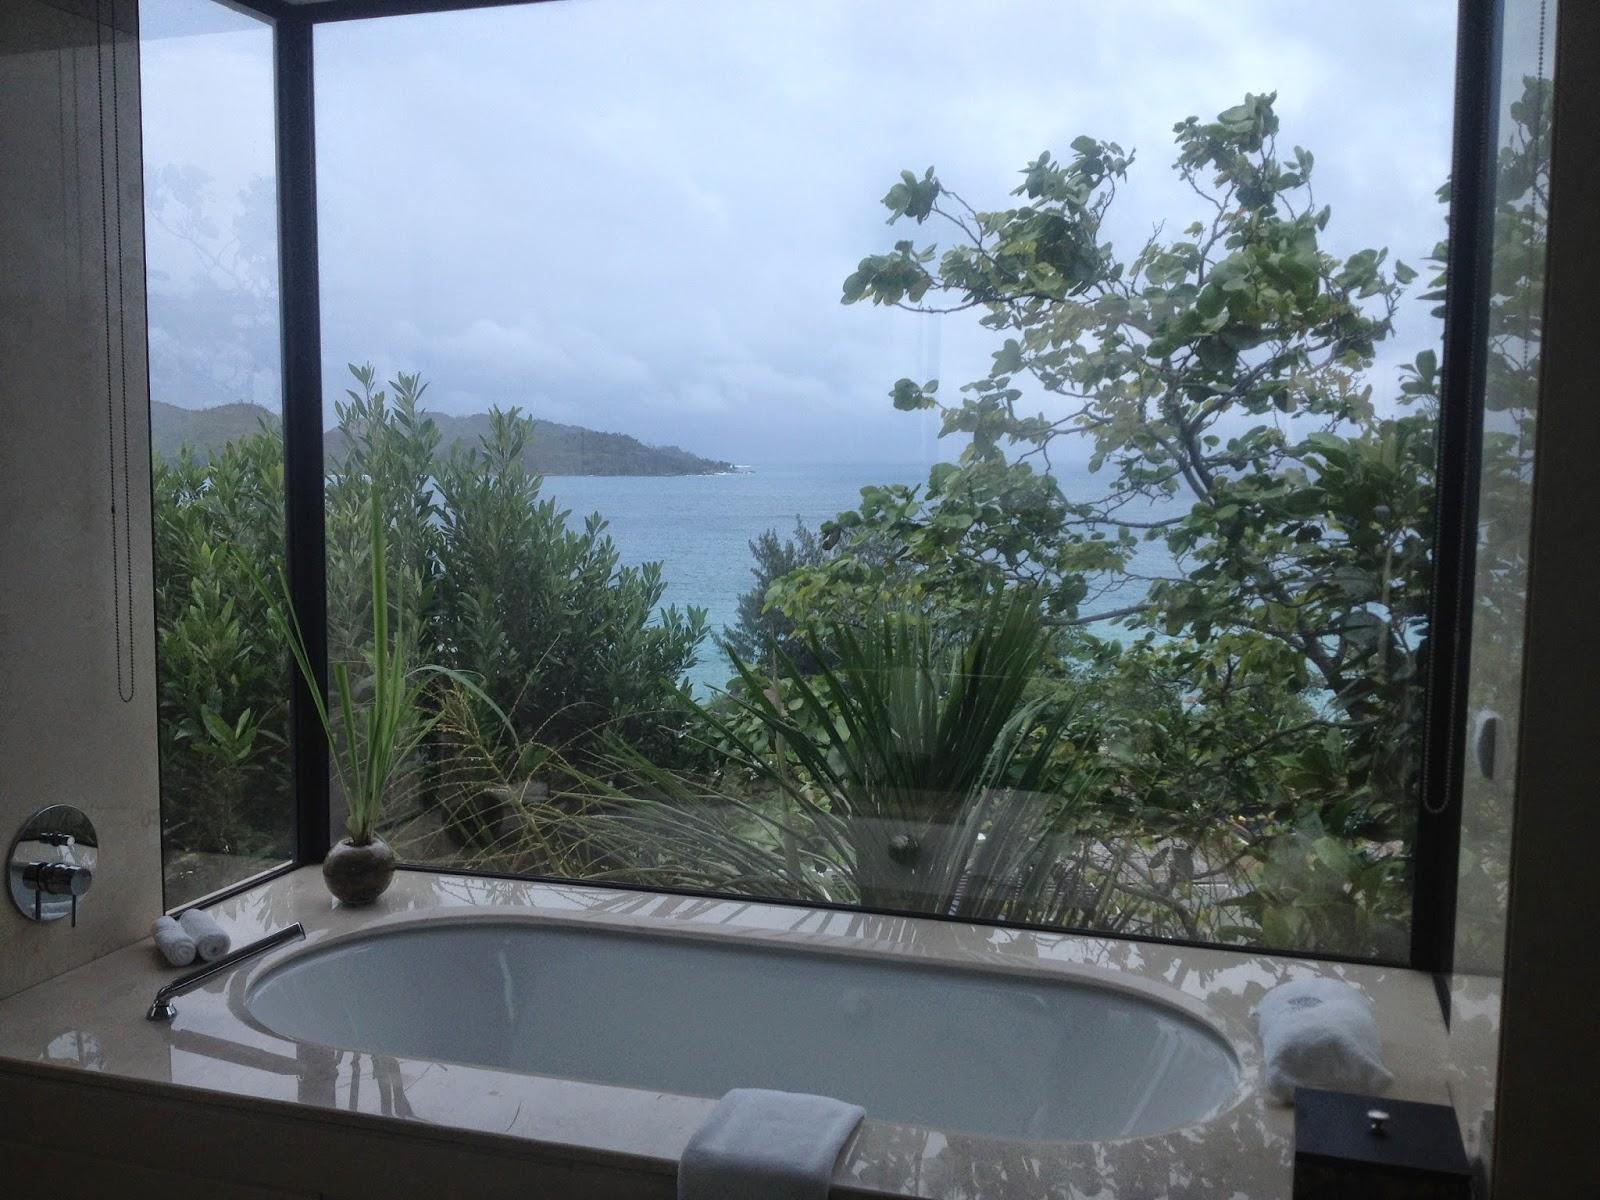 view in villa praslin, raffles seychelles